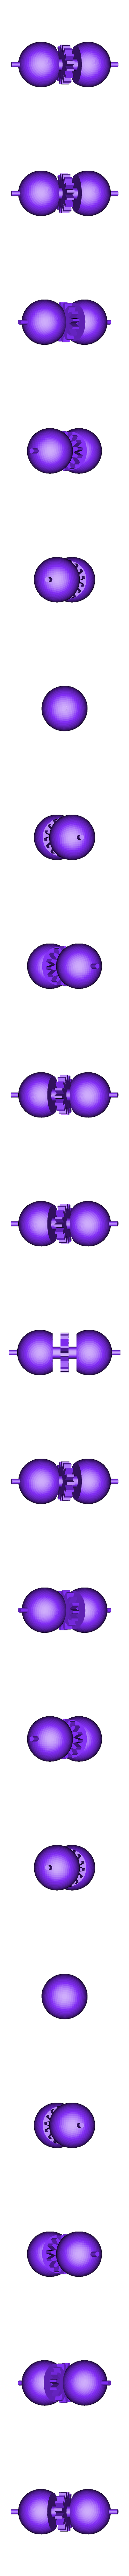 ojos 0.2.stl Download STL file Baby Yoda key holder • 3D printing model, Aslan3d